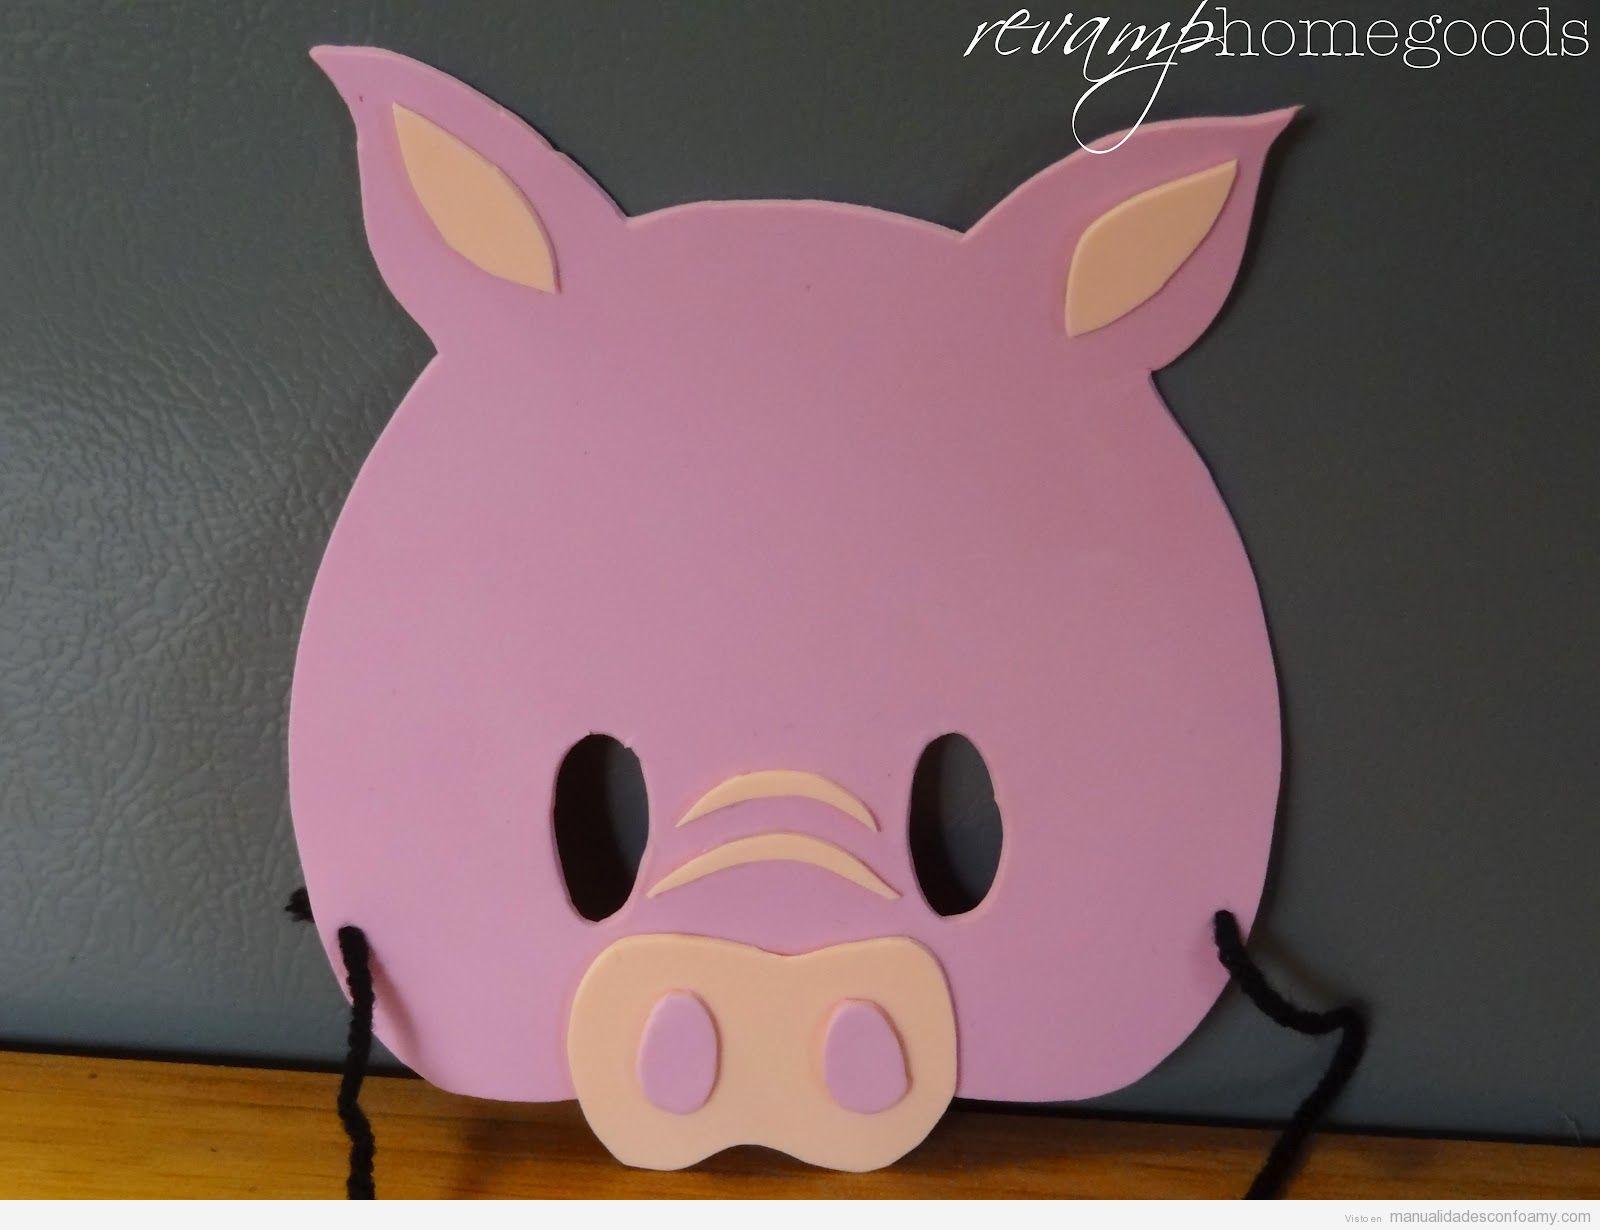 Máscara cerdo de foamy, manualidades para niños | Manualidades con ...